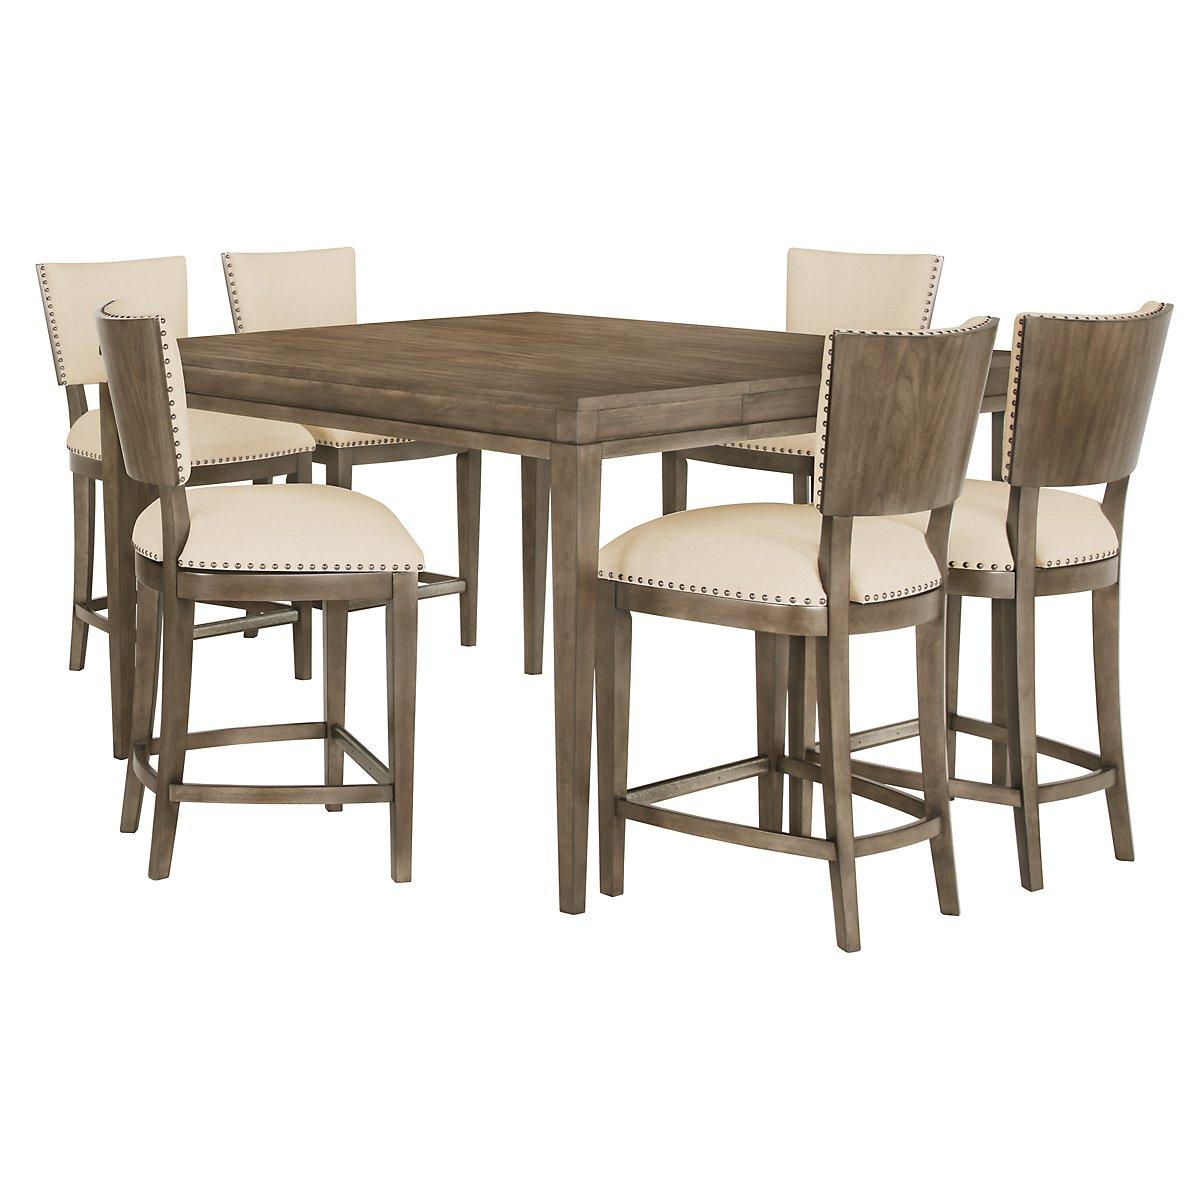 Preston Gray High Table & 4 Upholstered Barstools